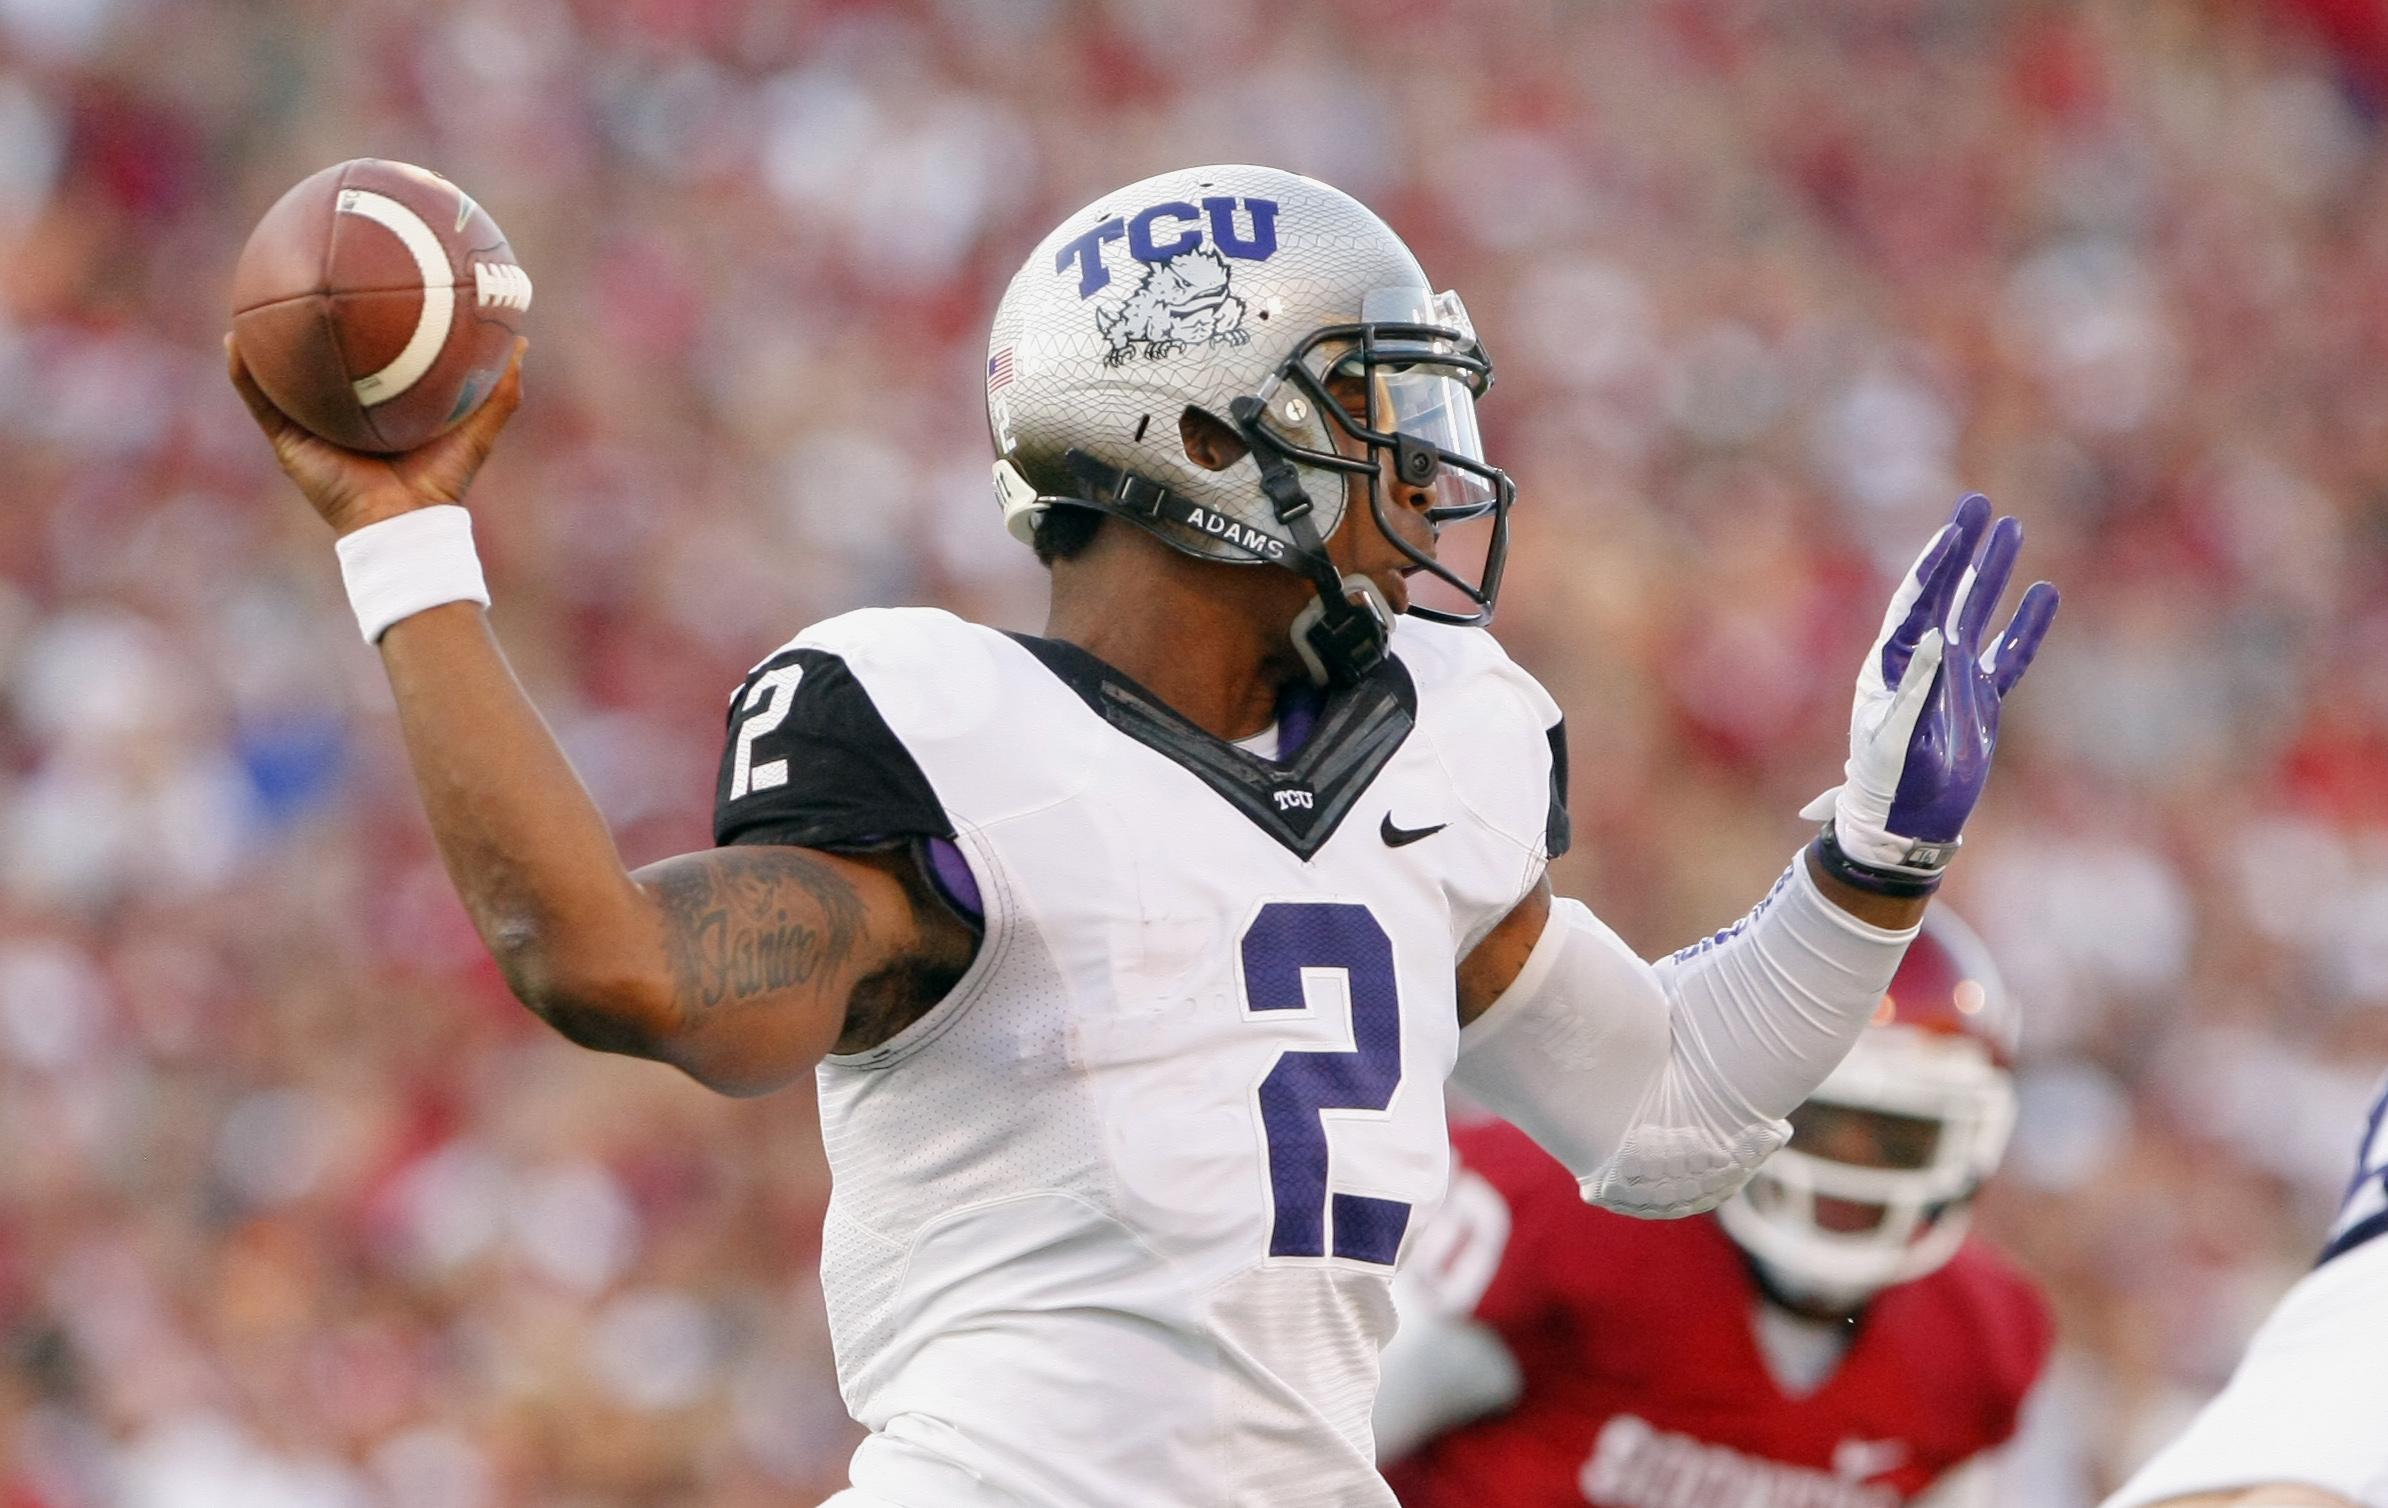 No. 11 Oklahoma holds off TCU 20-17